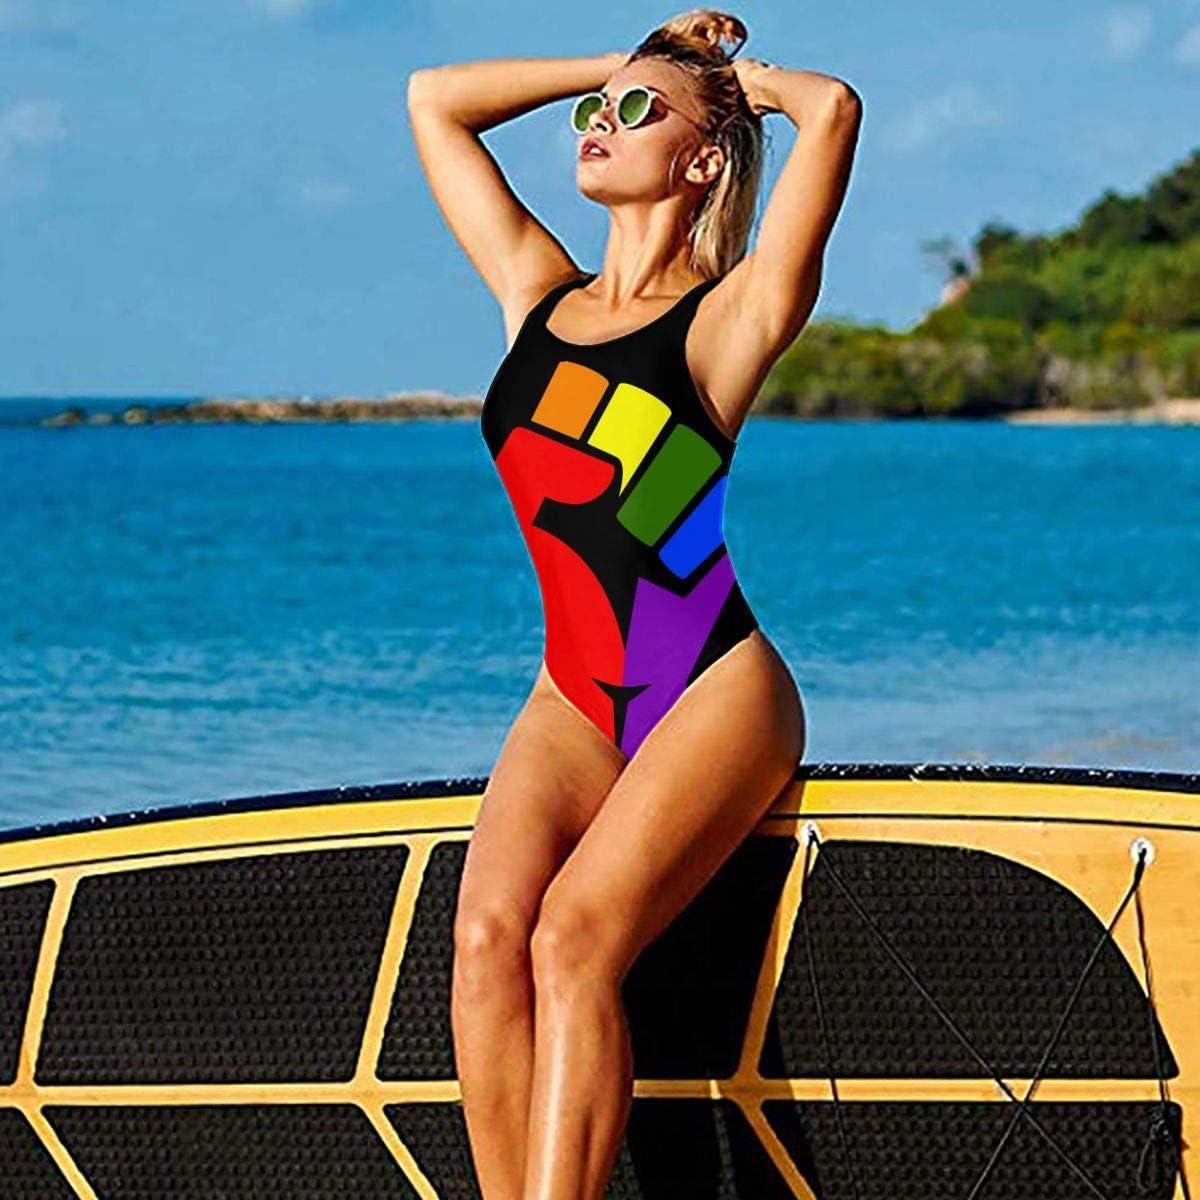 ZHXR Rhodes Island State Flag Womens One Piece Swimsuits for Athletic Swimwear Bikini